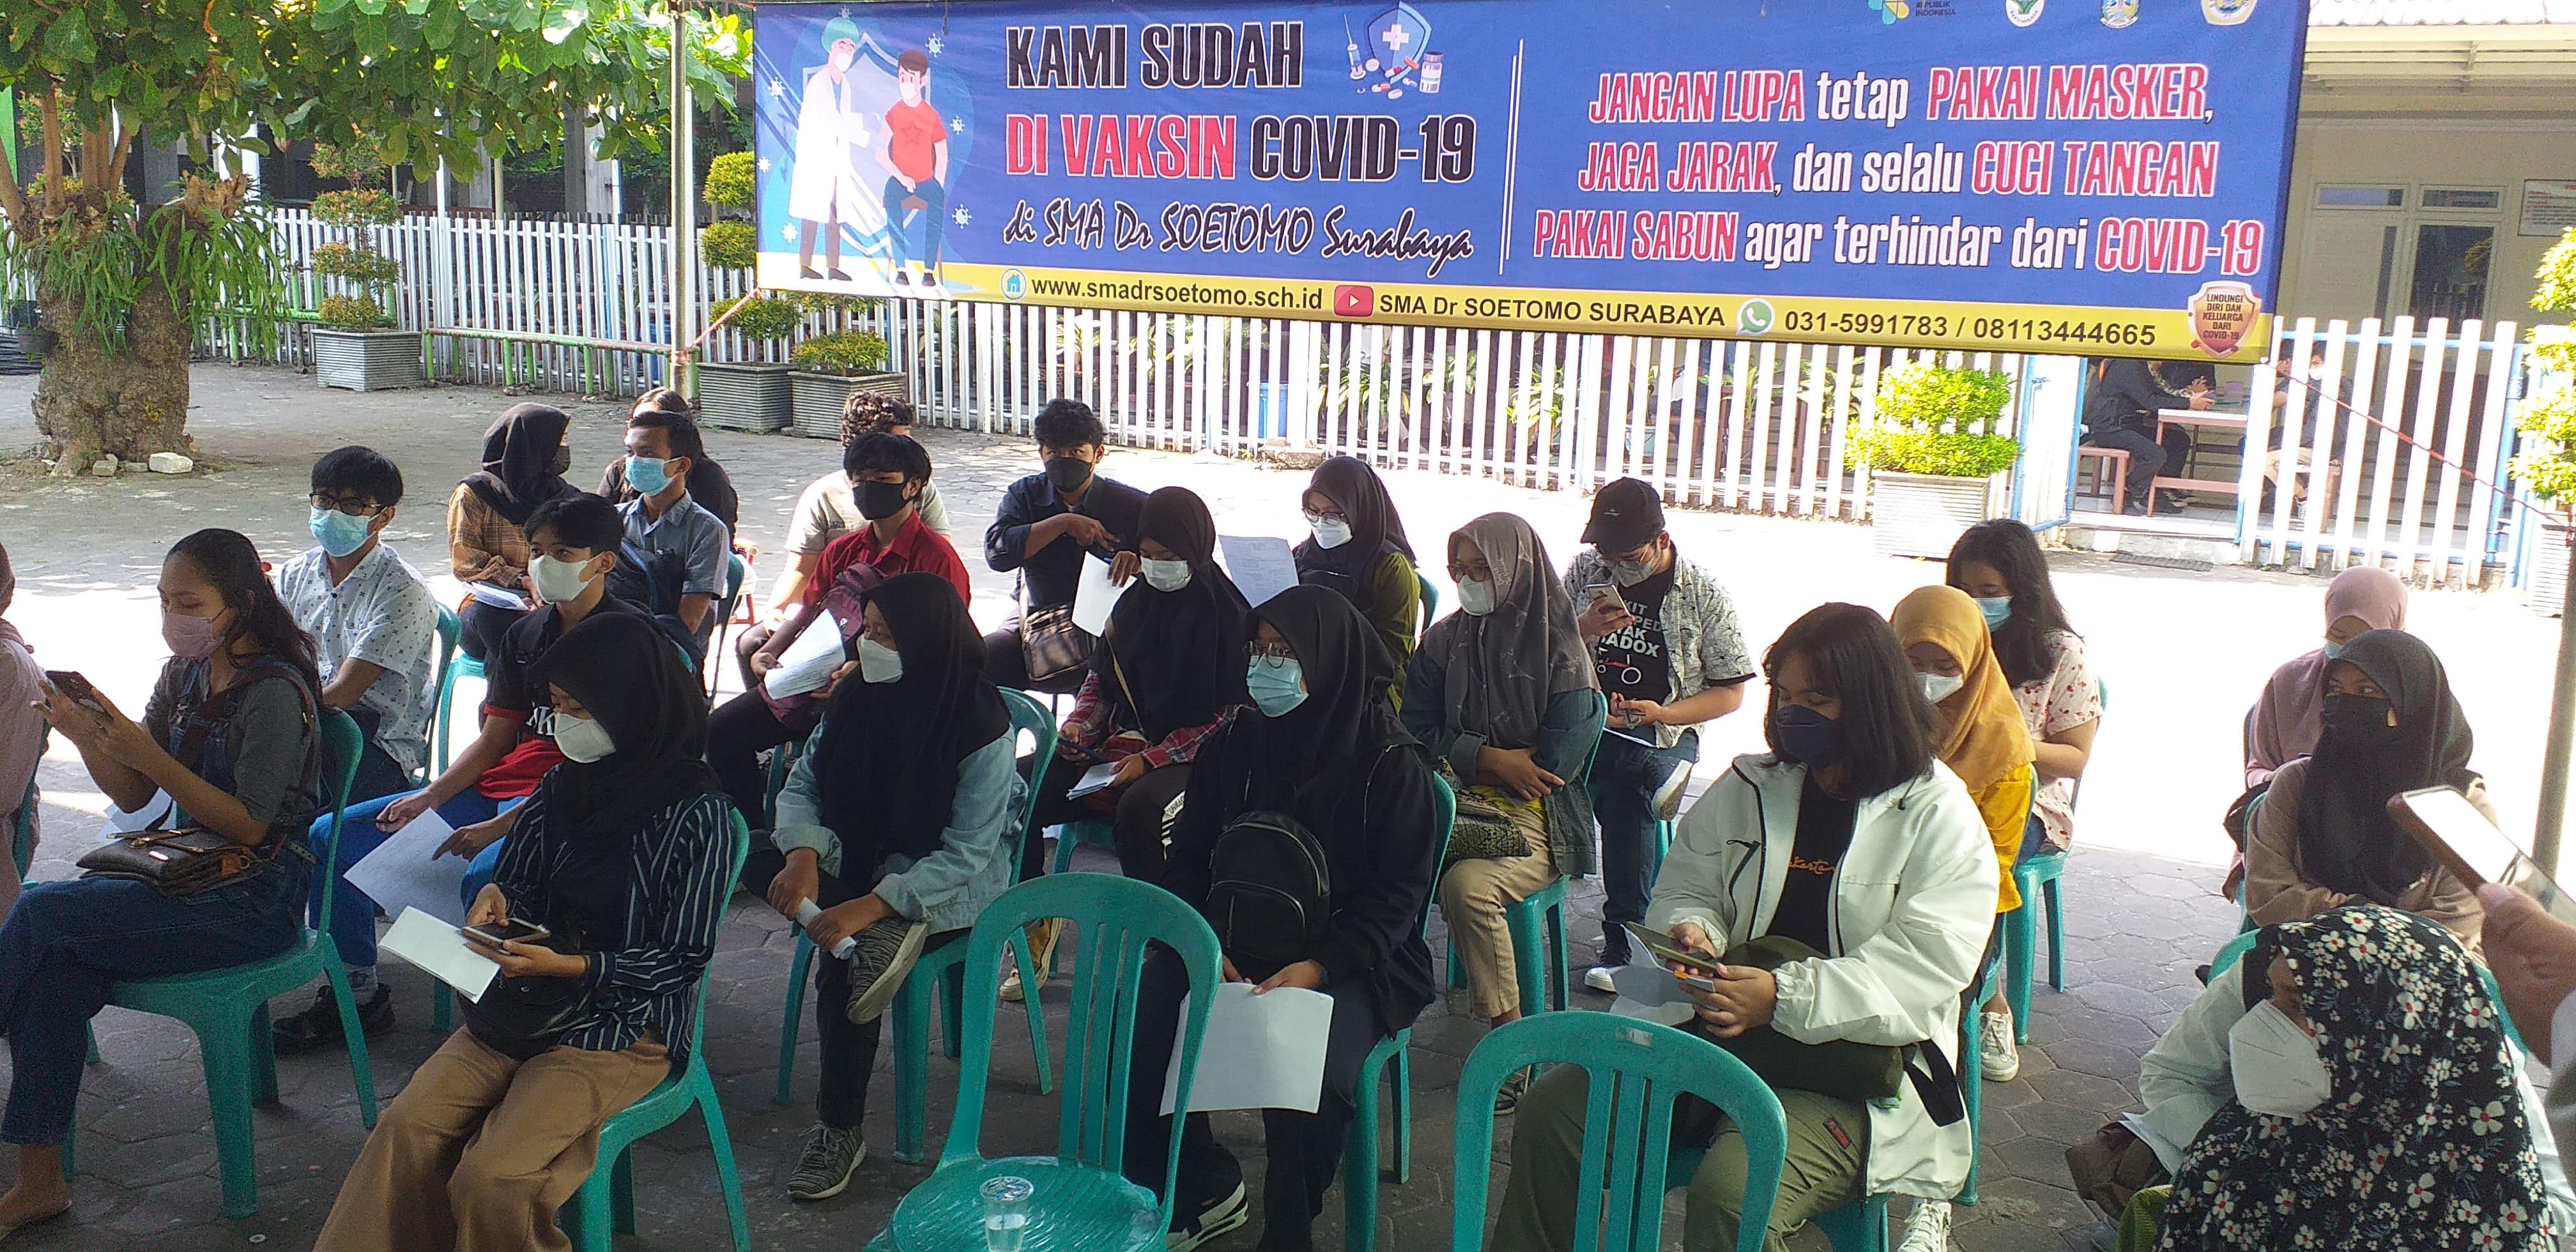 Vaksin C-19 di SMA Dr. Soetomo Surabaya